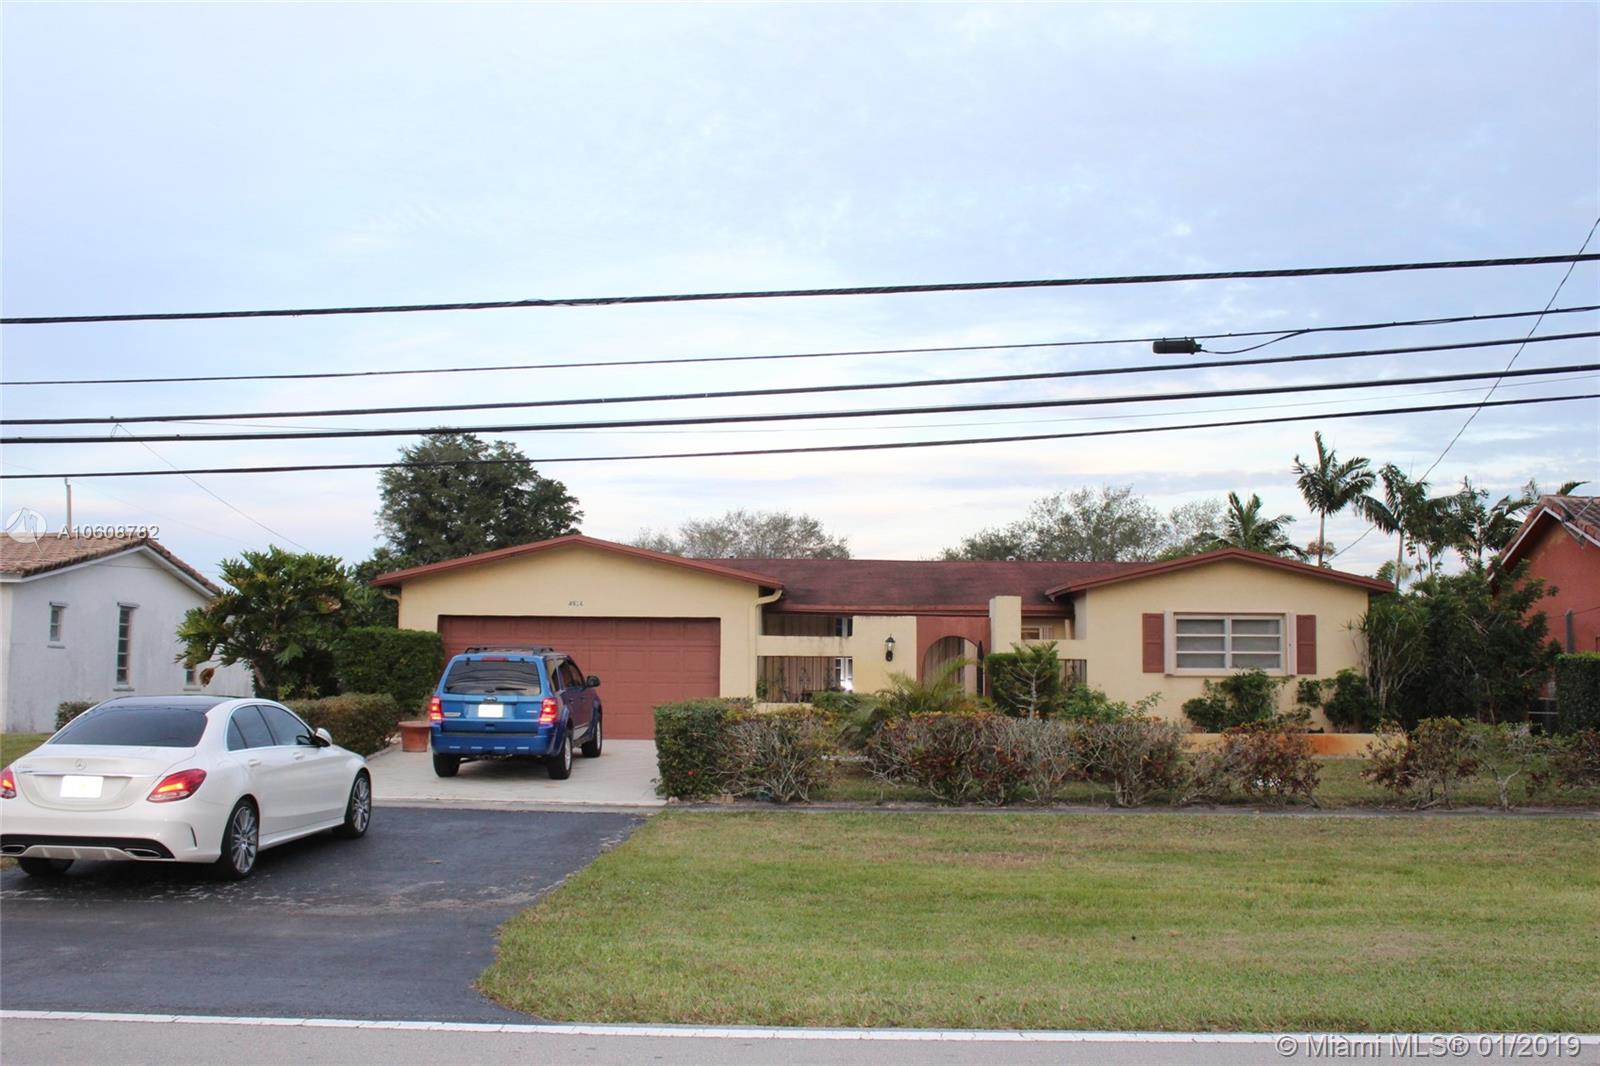 4914 SW 90th Ave, Cooper City FL 33328